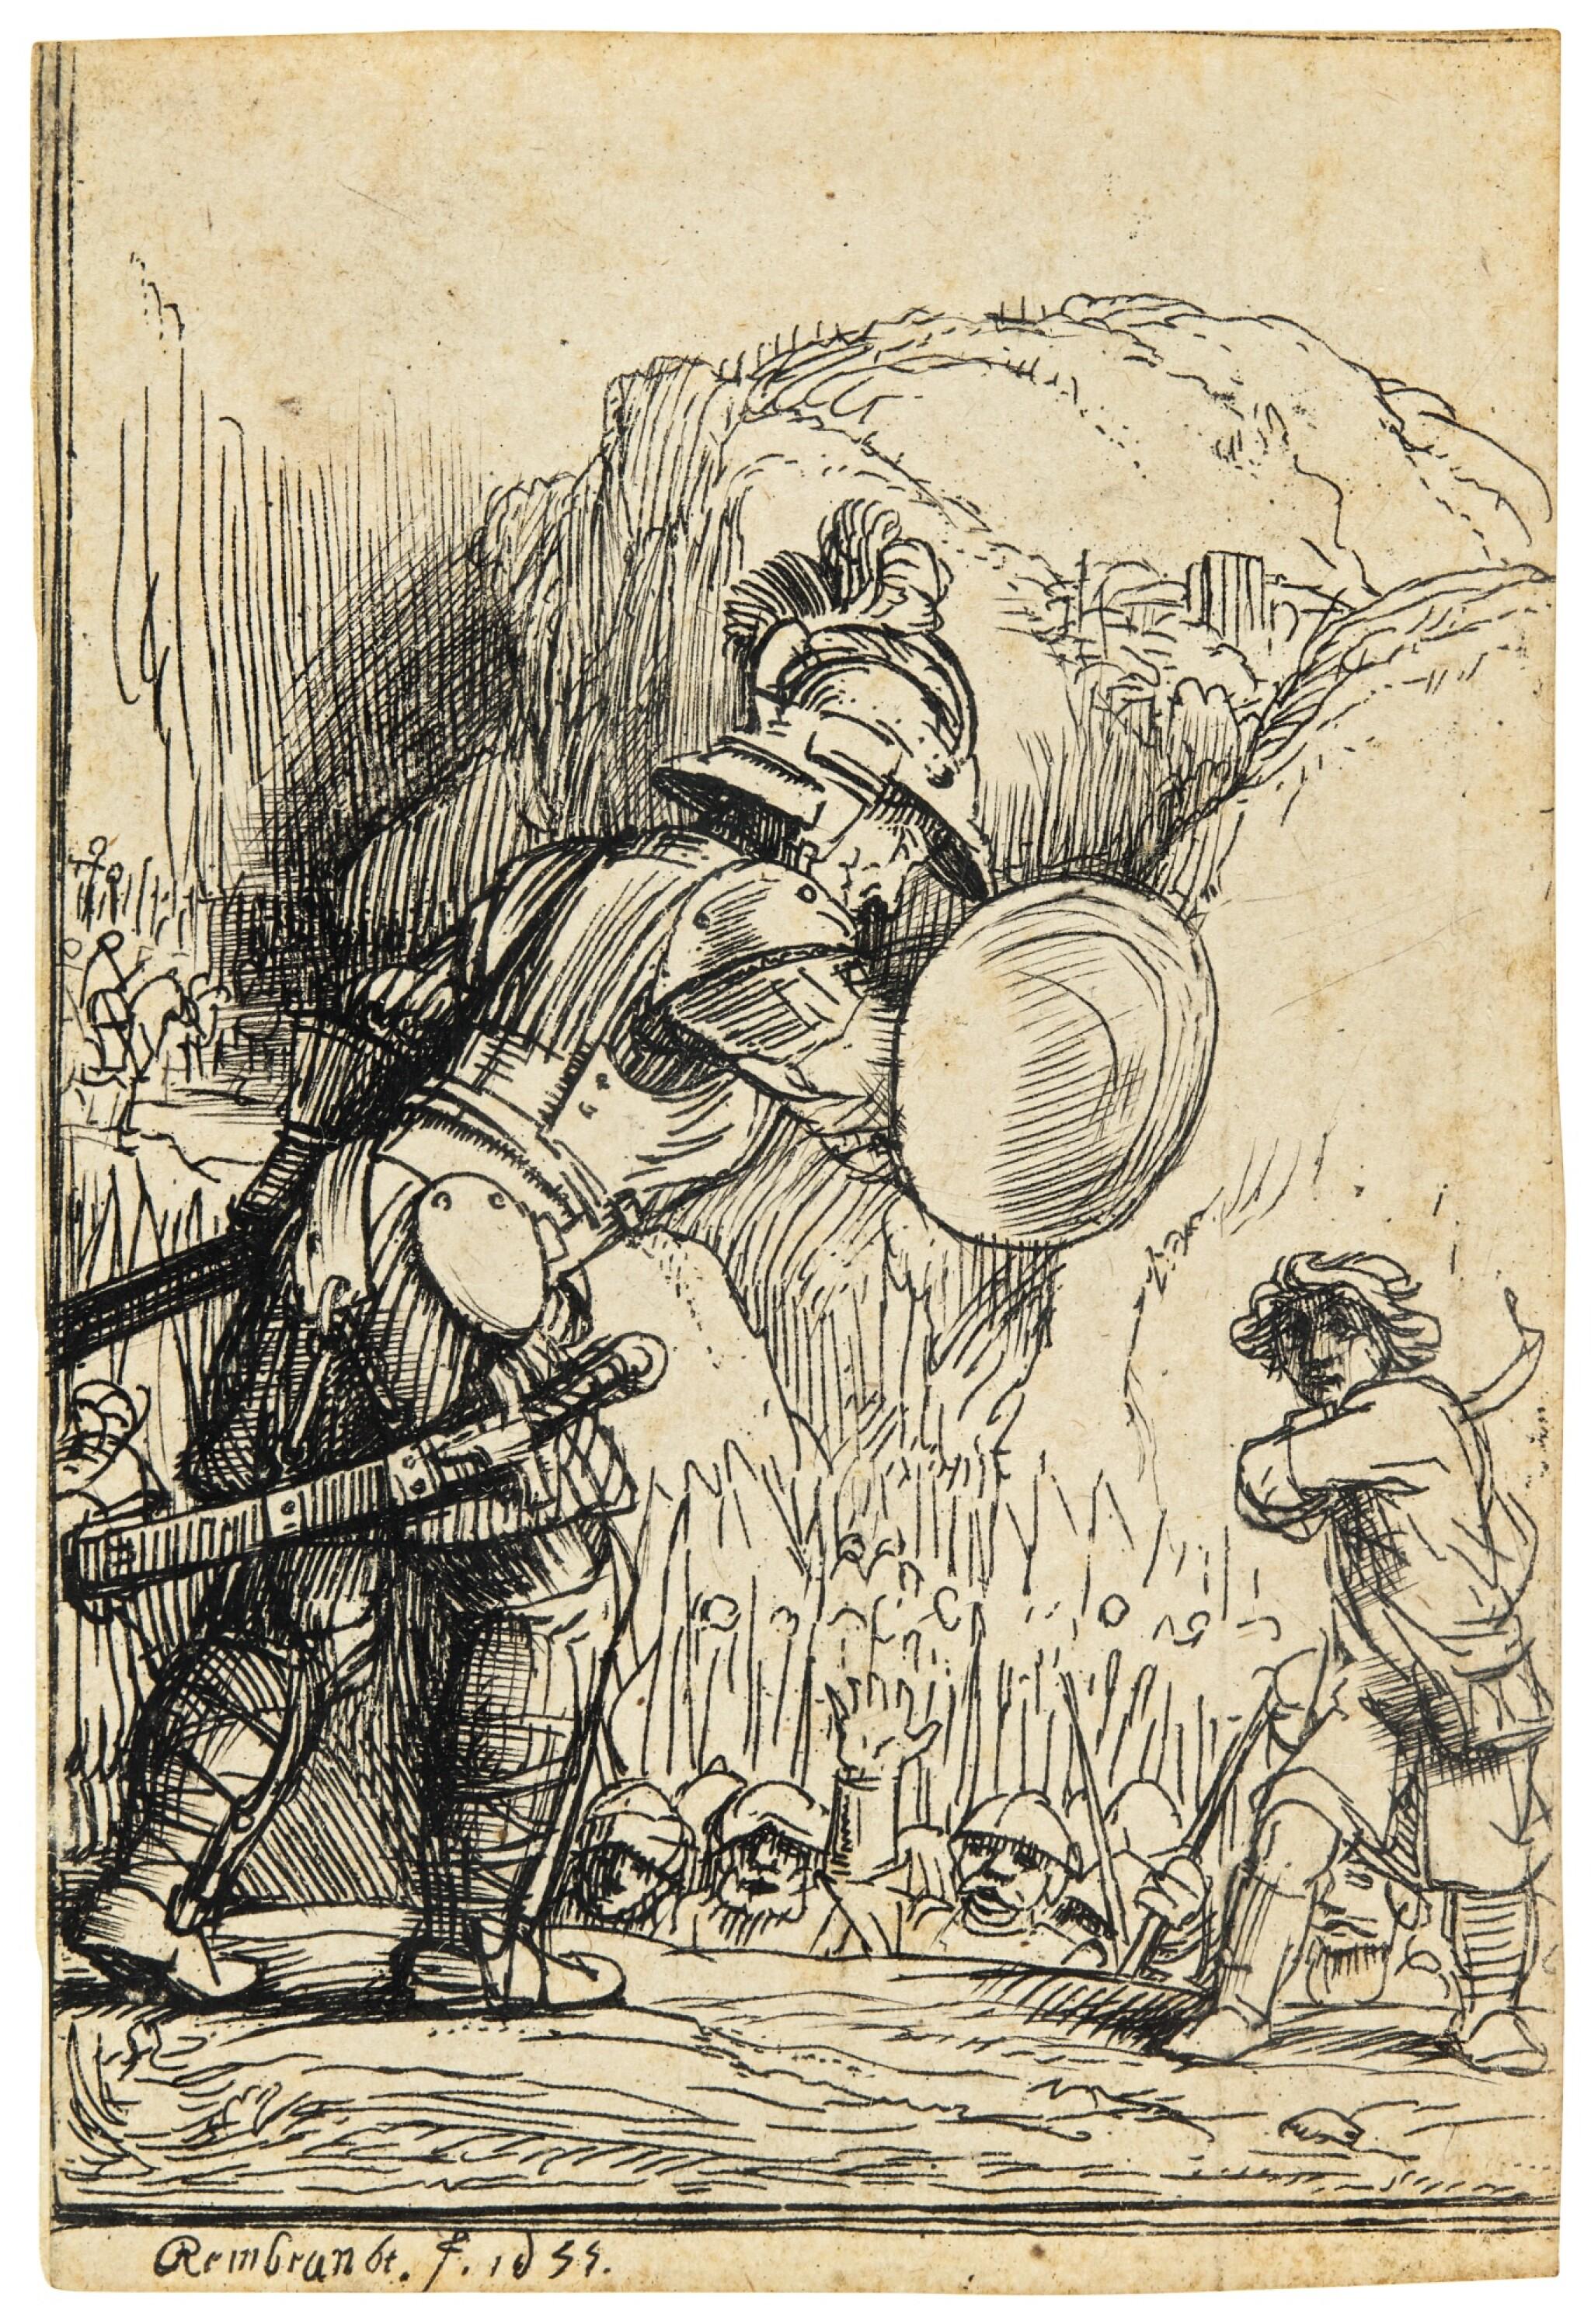 View full screen - View 1 of Lot 59. REMBRANDT HARMENSZ. VAN RIJN  |  DAVID AND GOLIATH (B., HOLL. 36; NEW HOLL. 288C; H. 284).